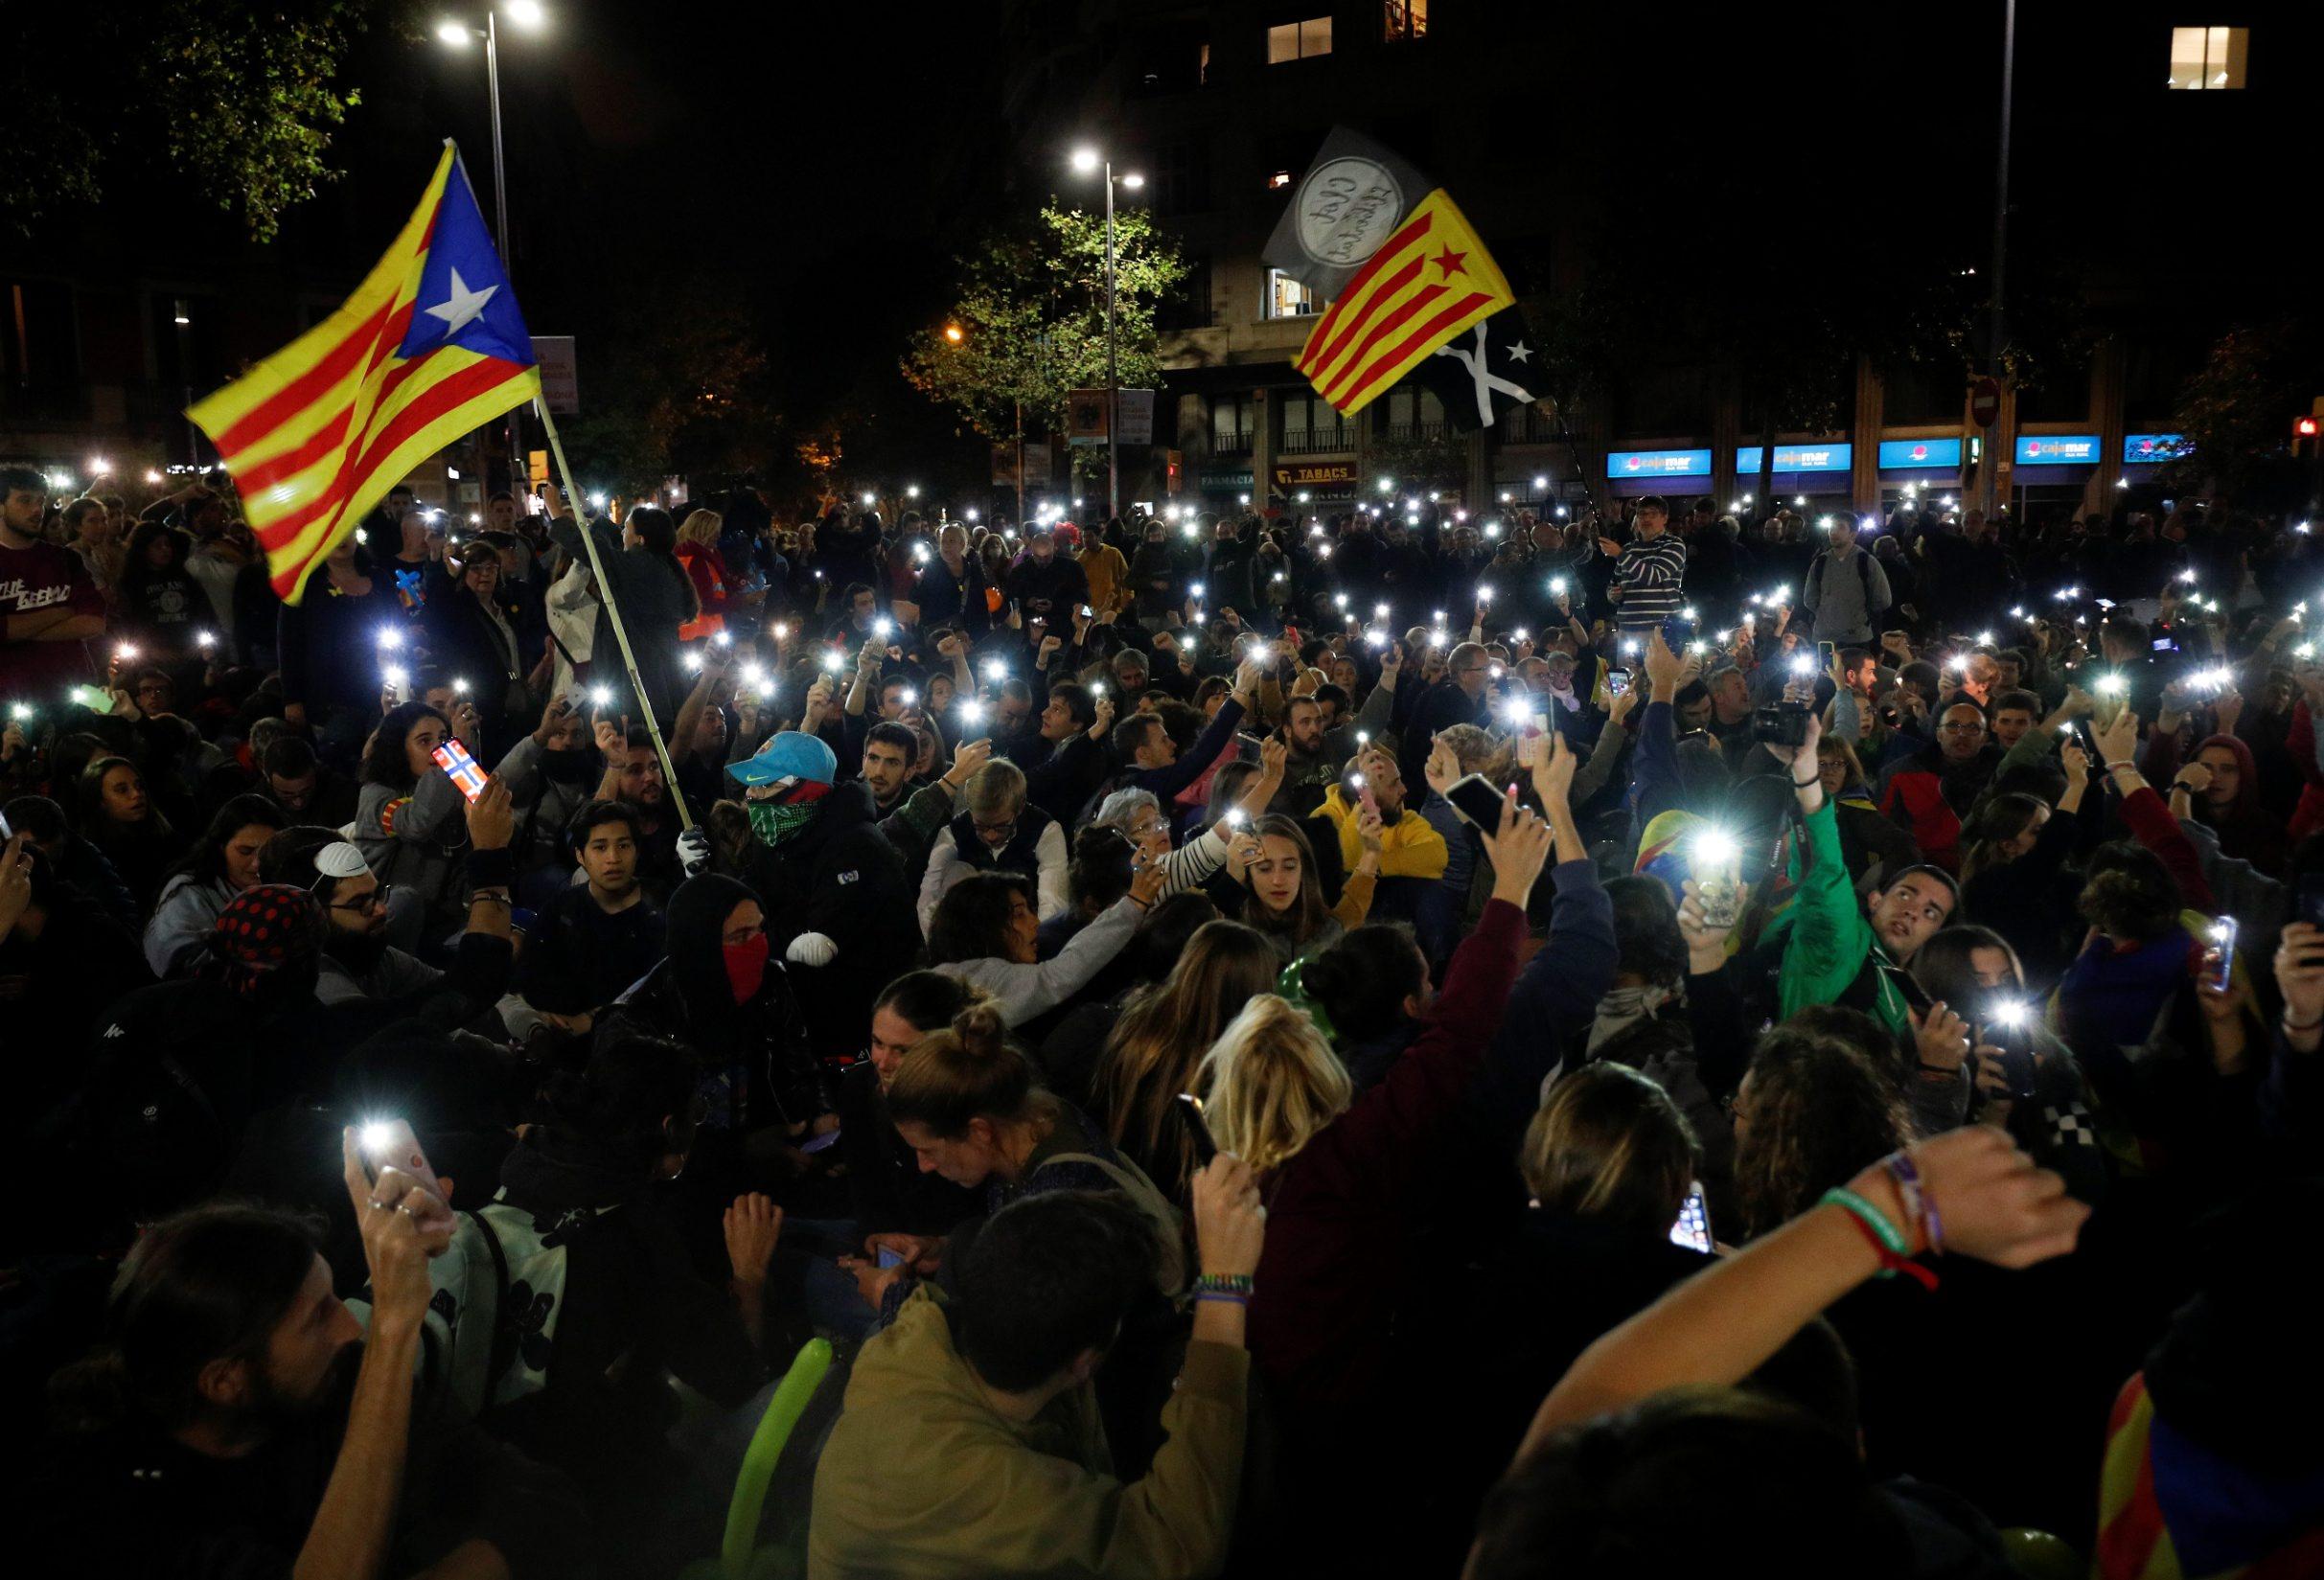 2019-10-21T184054Z_1668256899_RC13CD8DEDF0_RTRMADP_3_SPAIN-POLITICS-CATALONIA-PROTEST-BALLOONS